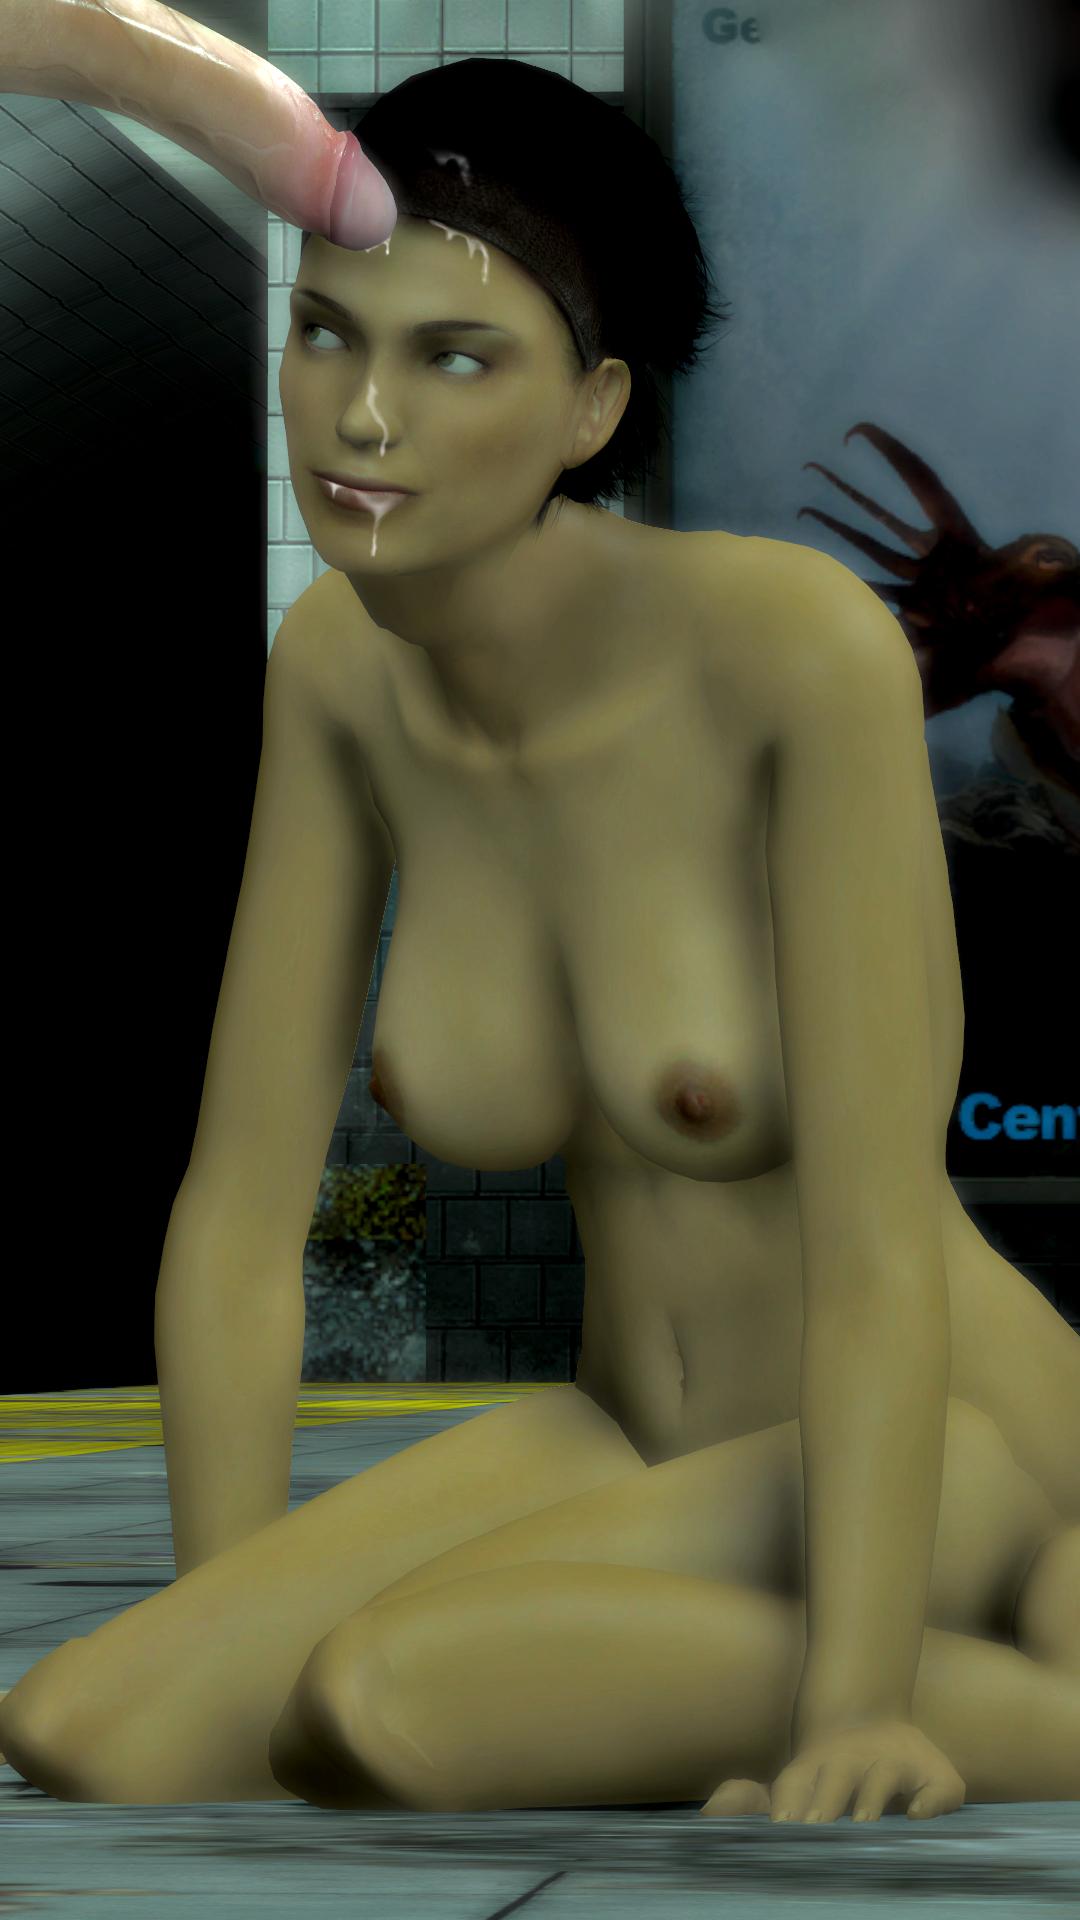 Half-life porn gif porn tube